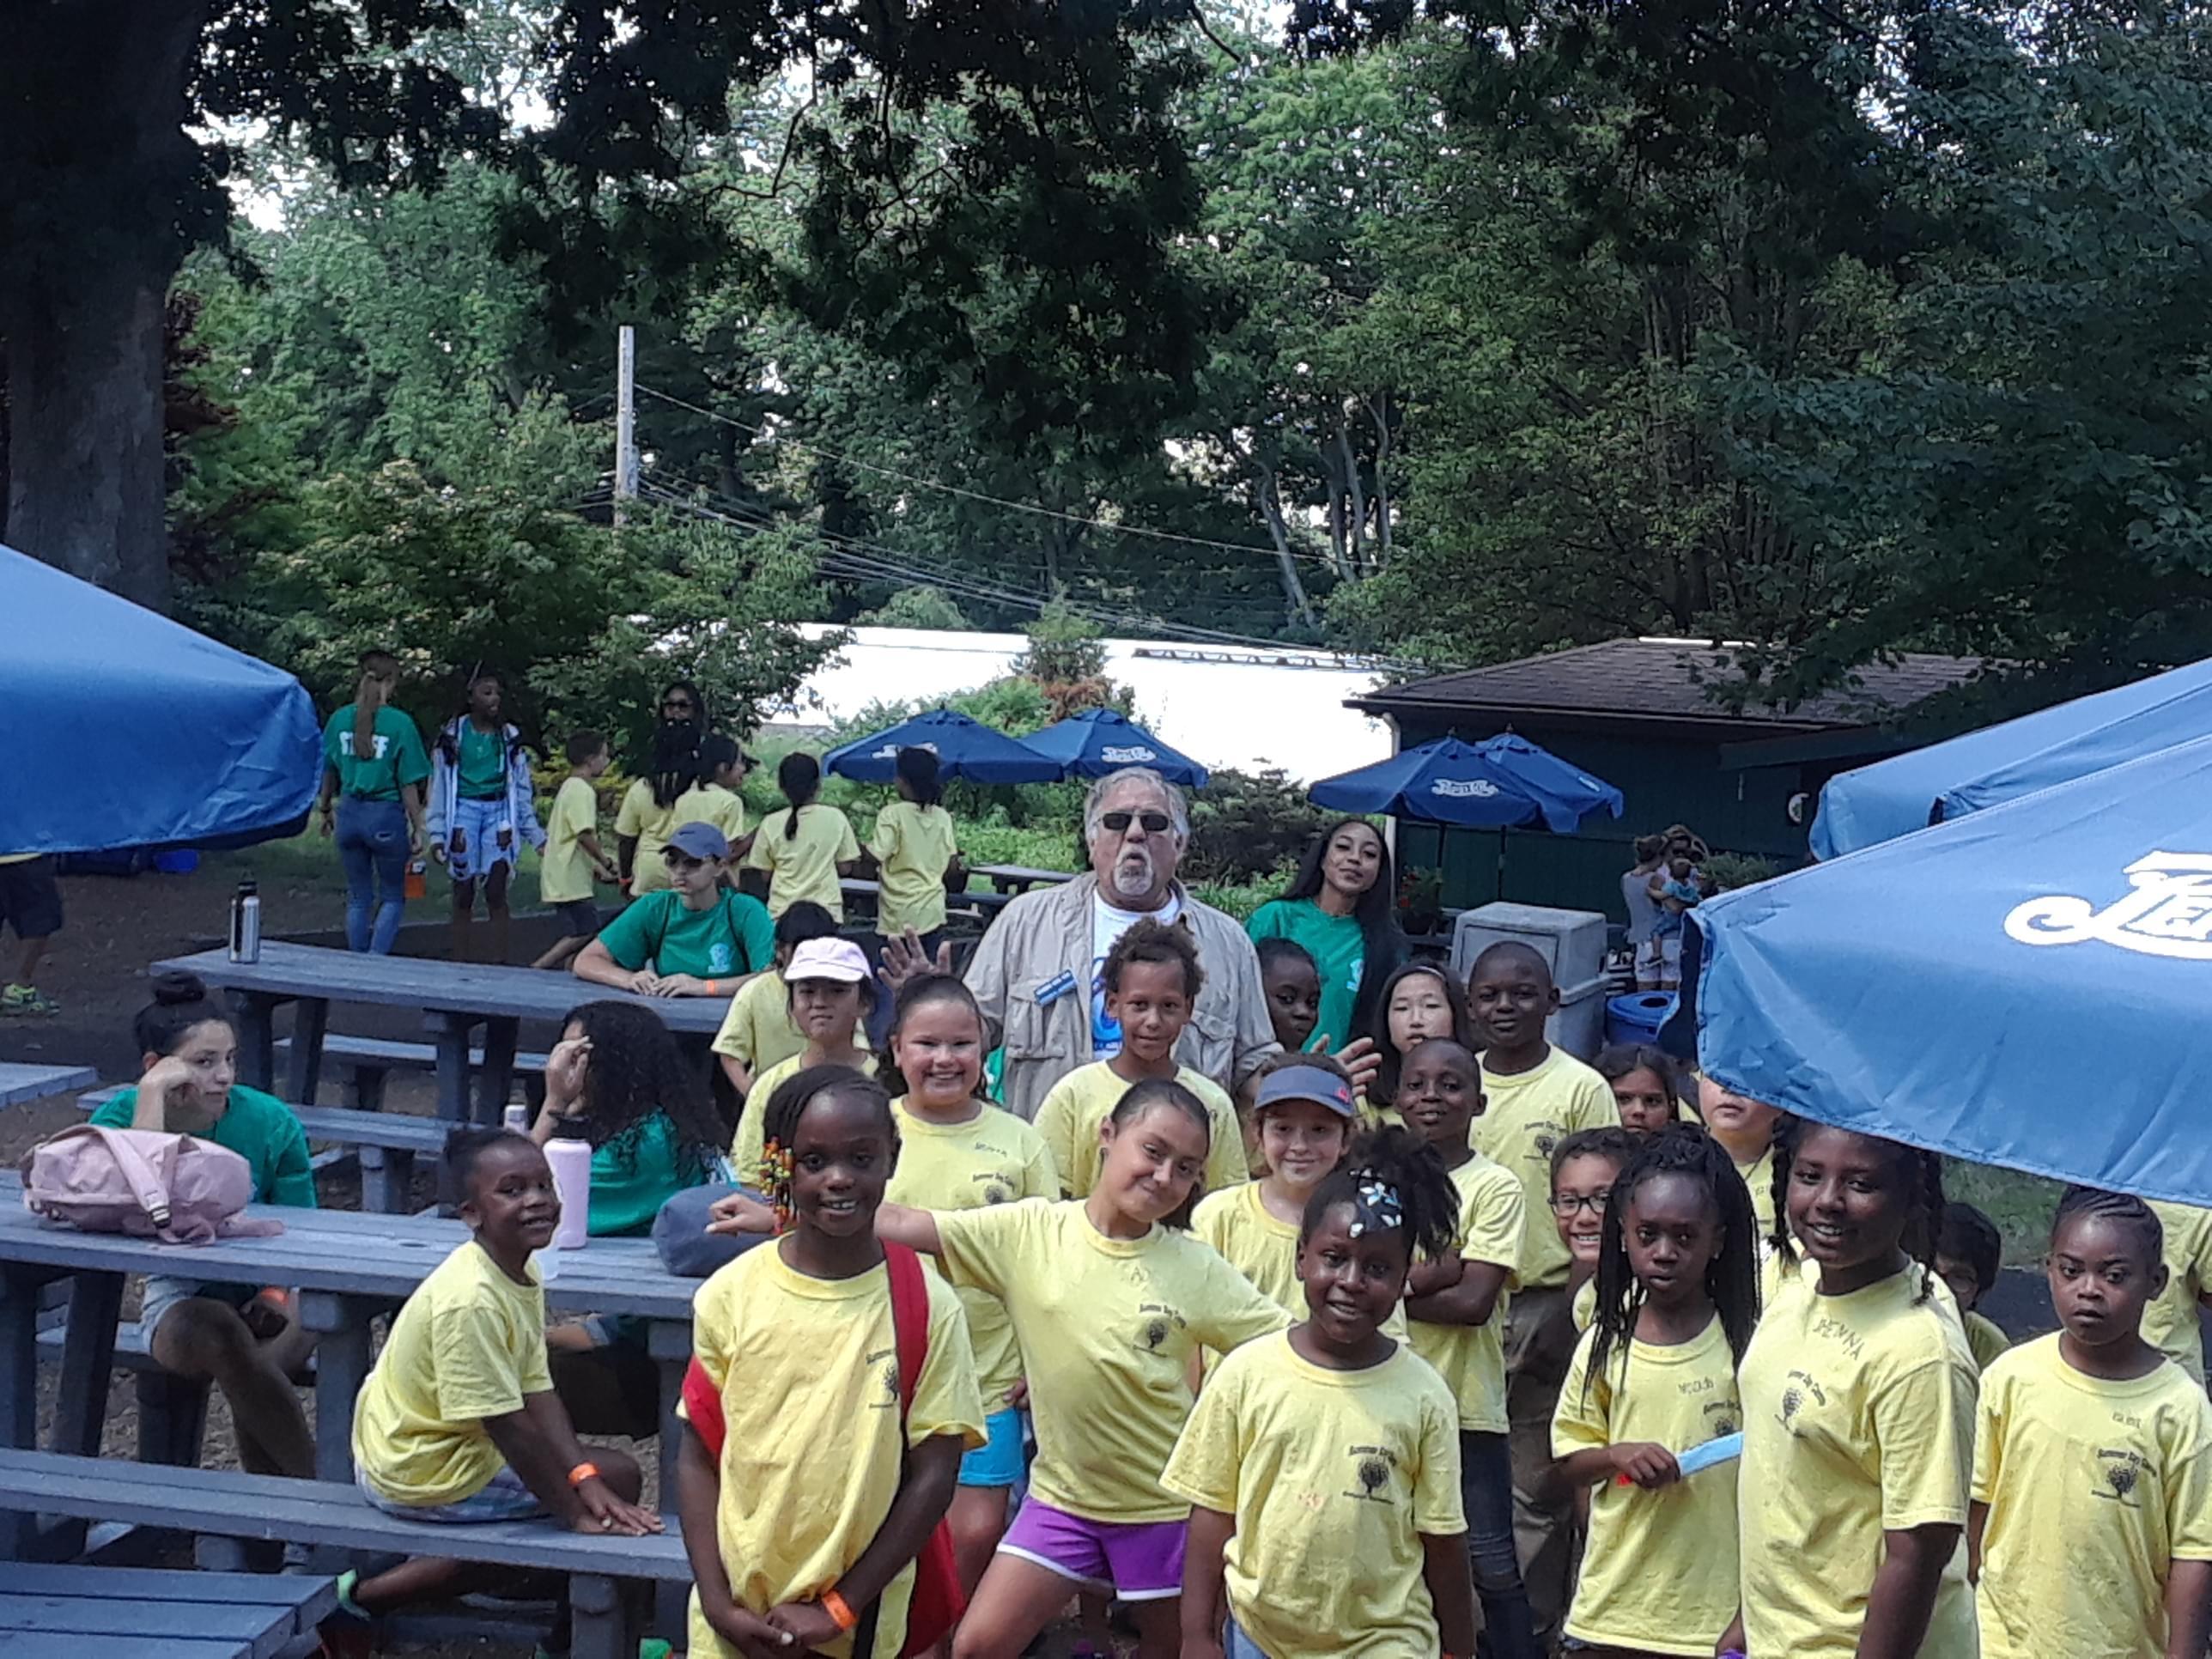 CT's Beardsley Zoo Kids Week Kick Off Photos